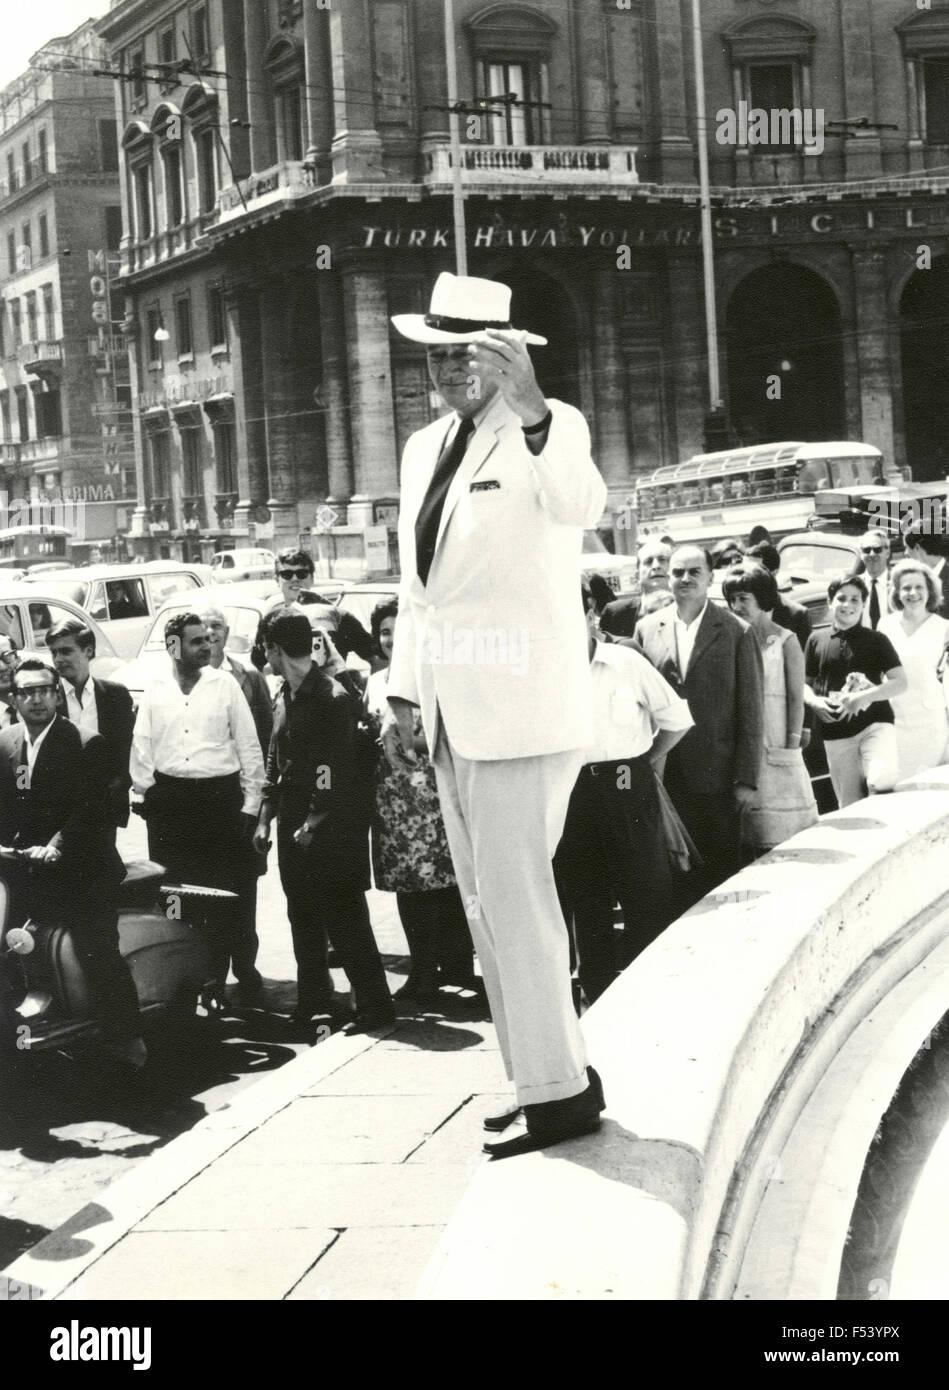 The American actor John Wayne walking in Rome , Italy - Stock Image